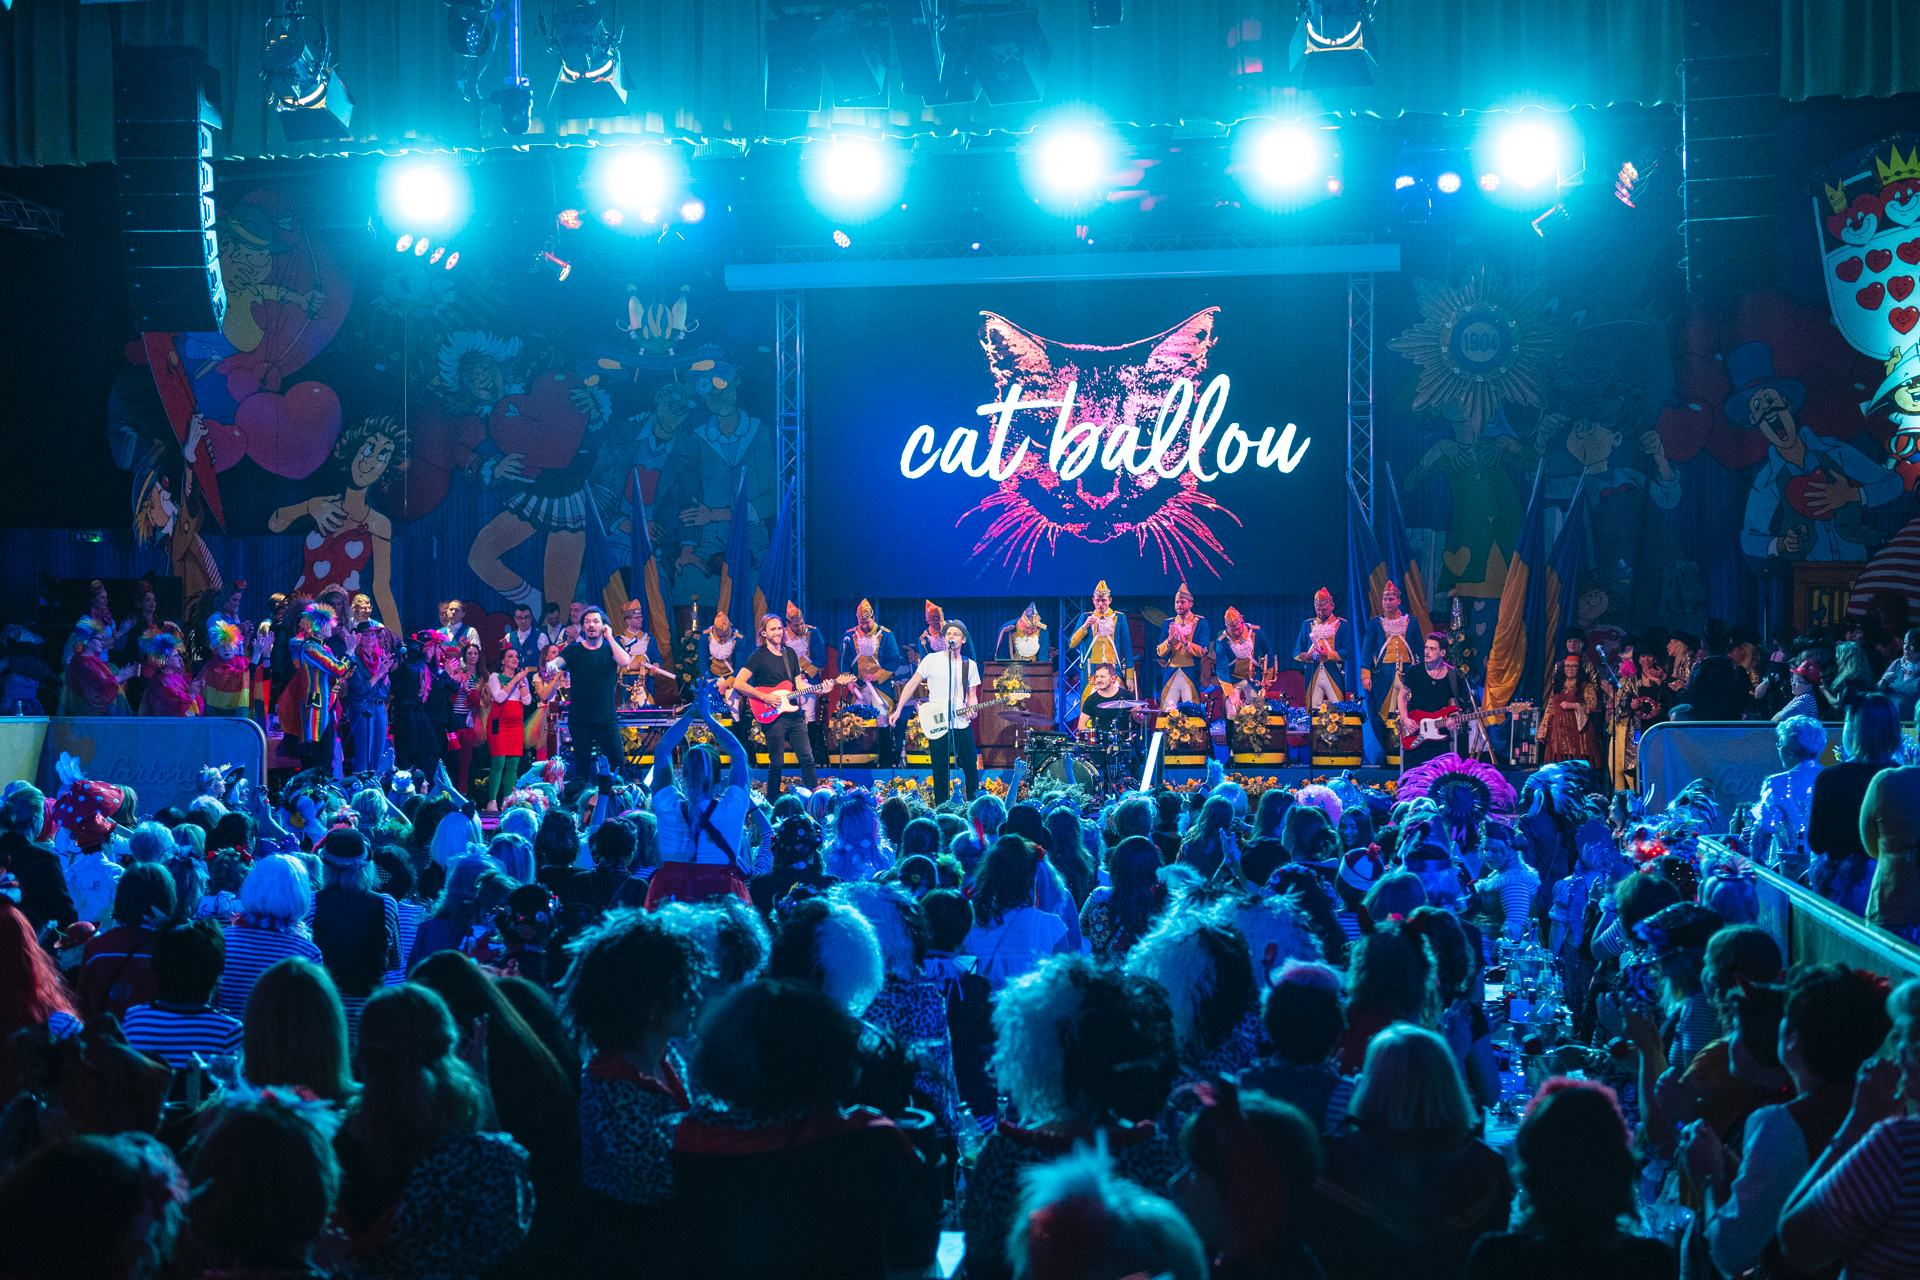 Eventfotografie - Cat Ballou live